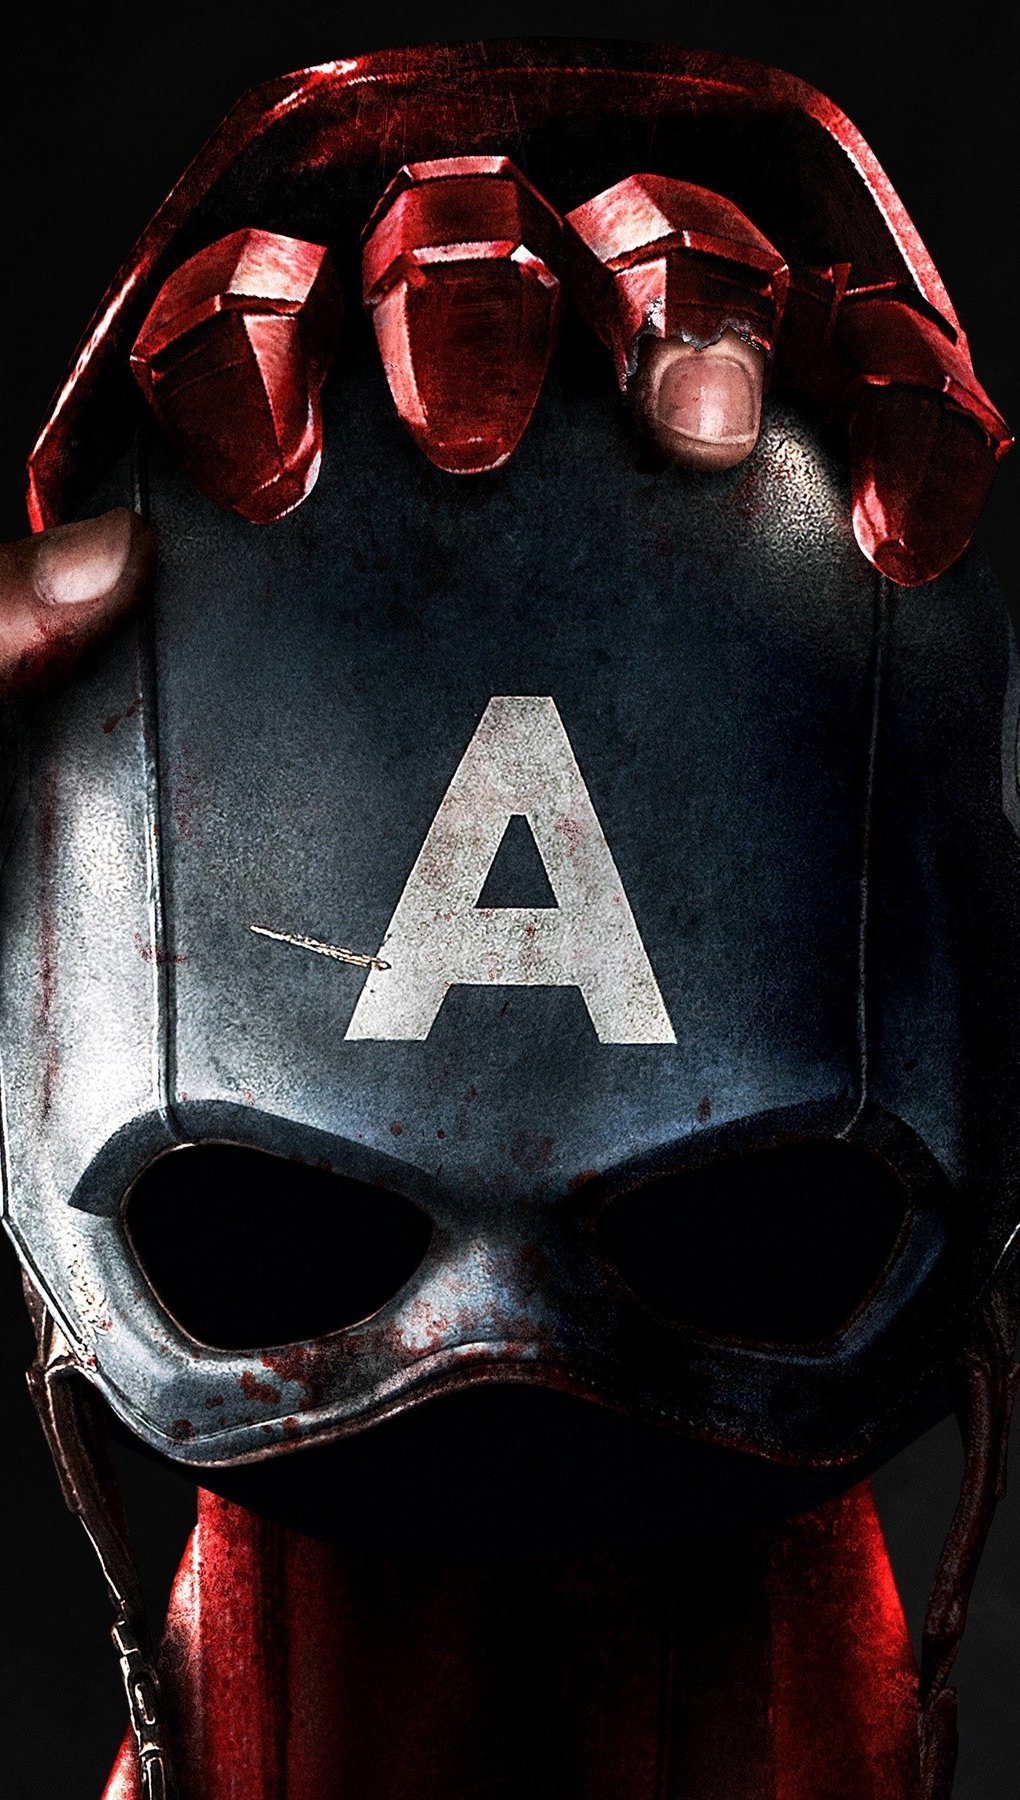 Fondos de pantalla Capitan America y Iron man Civil War Vertical